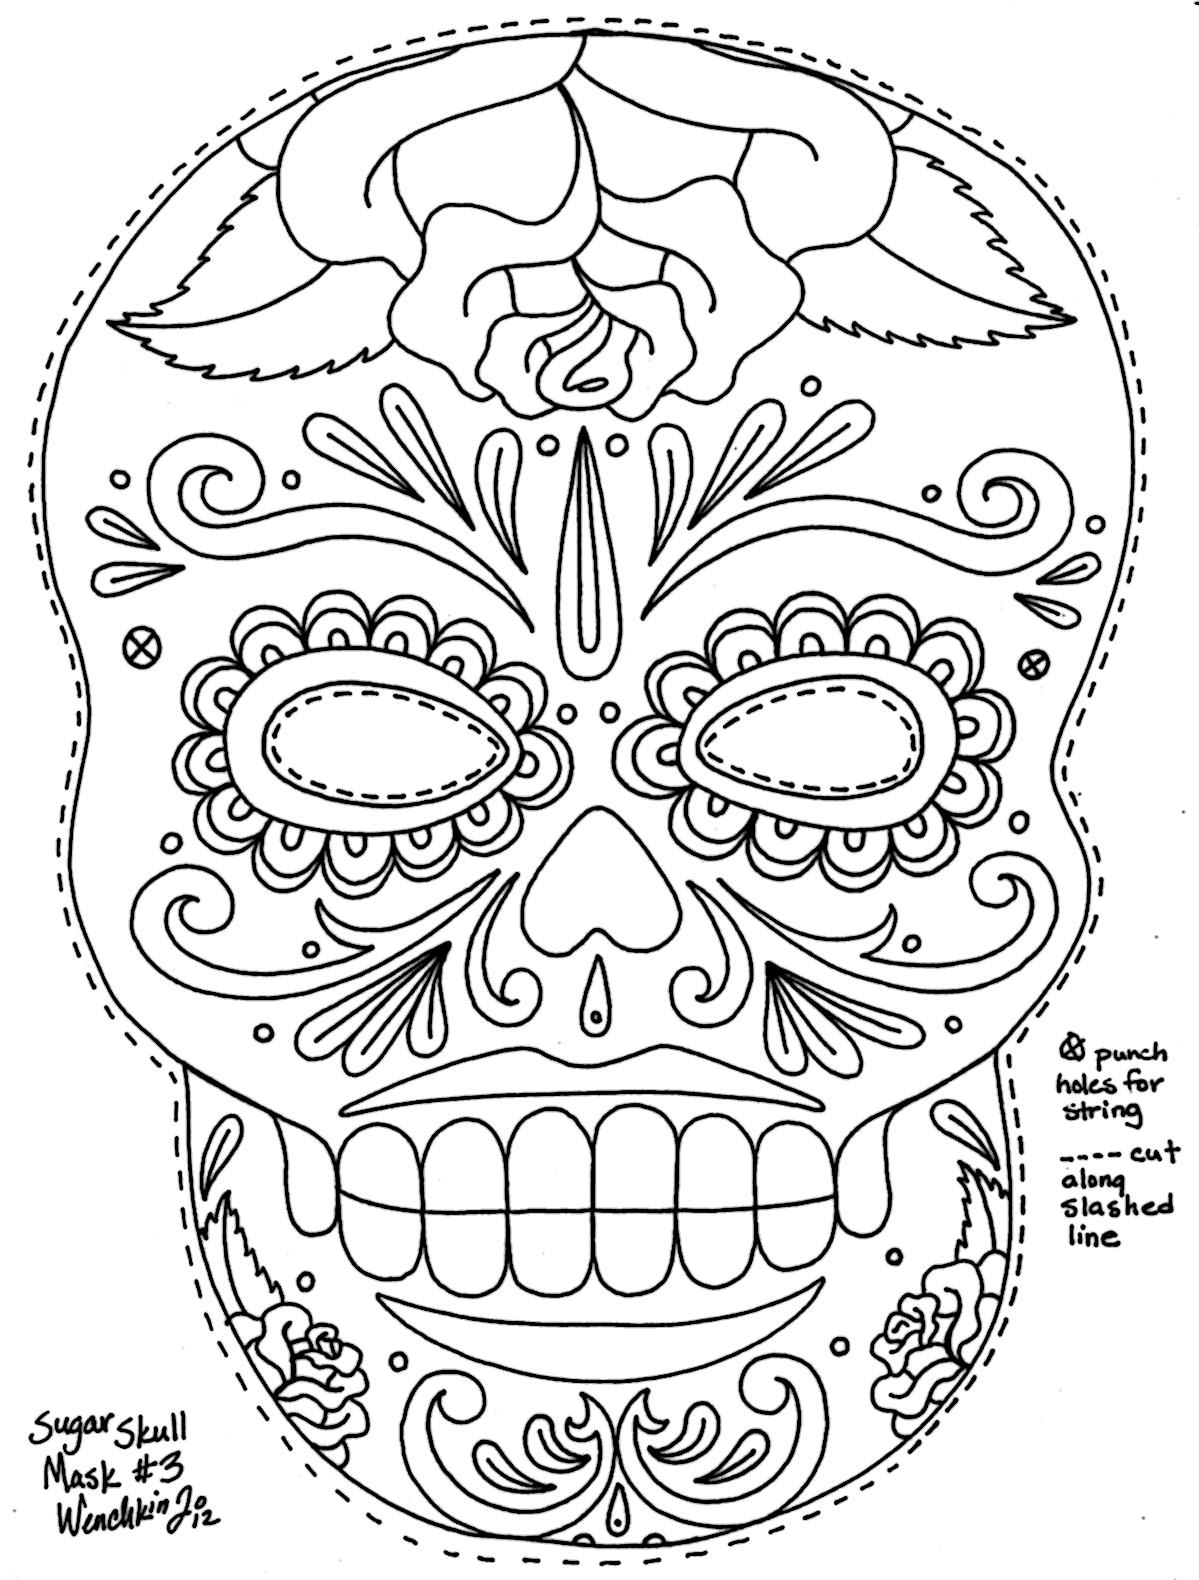 skeleton mask printable halloween fun for kids in school printable mask skeleton